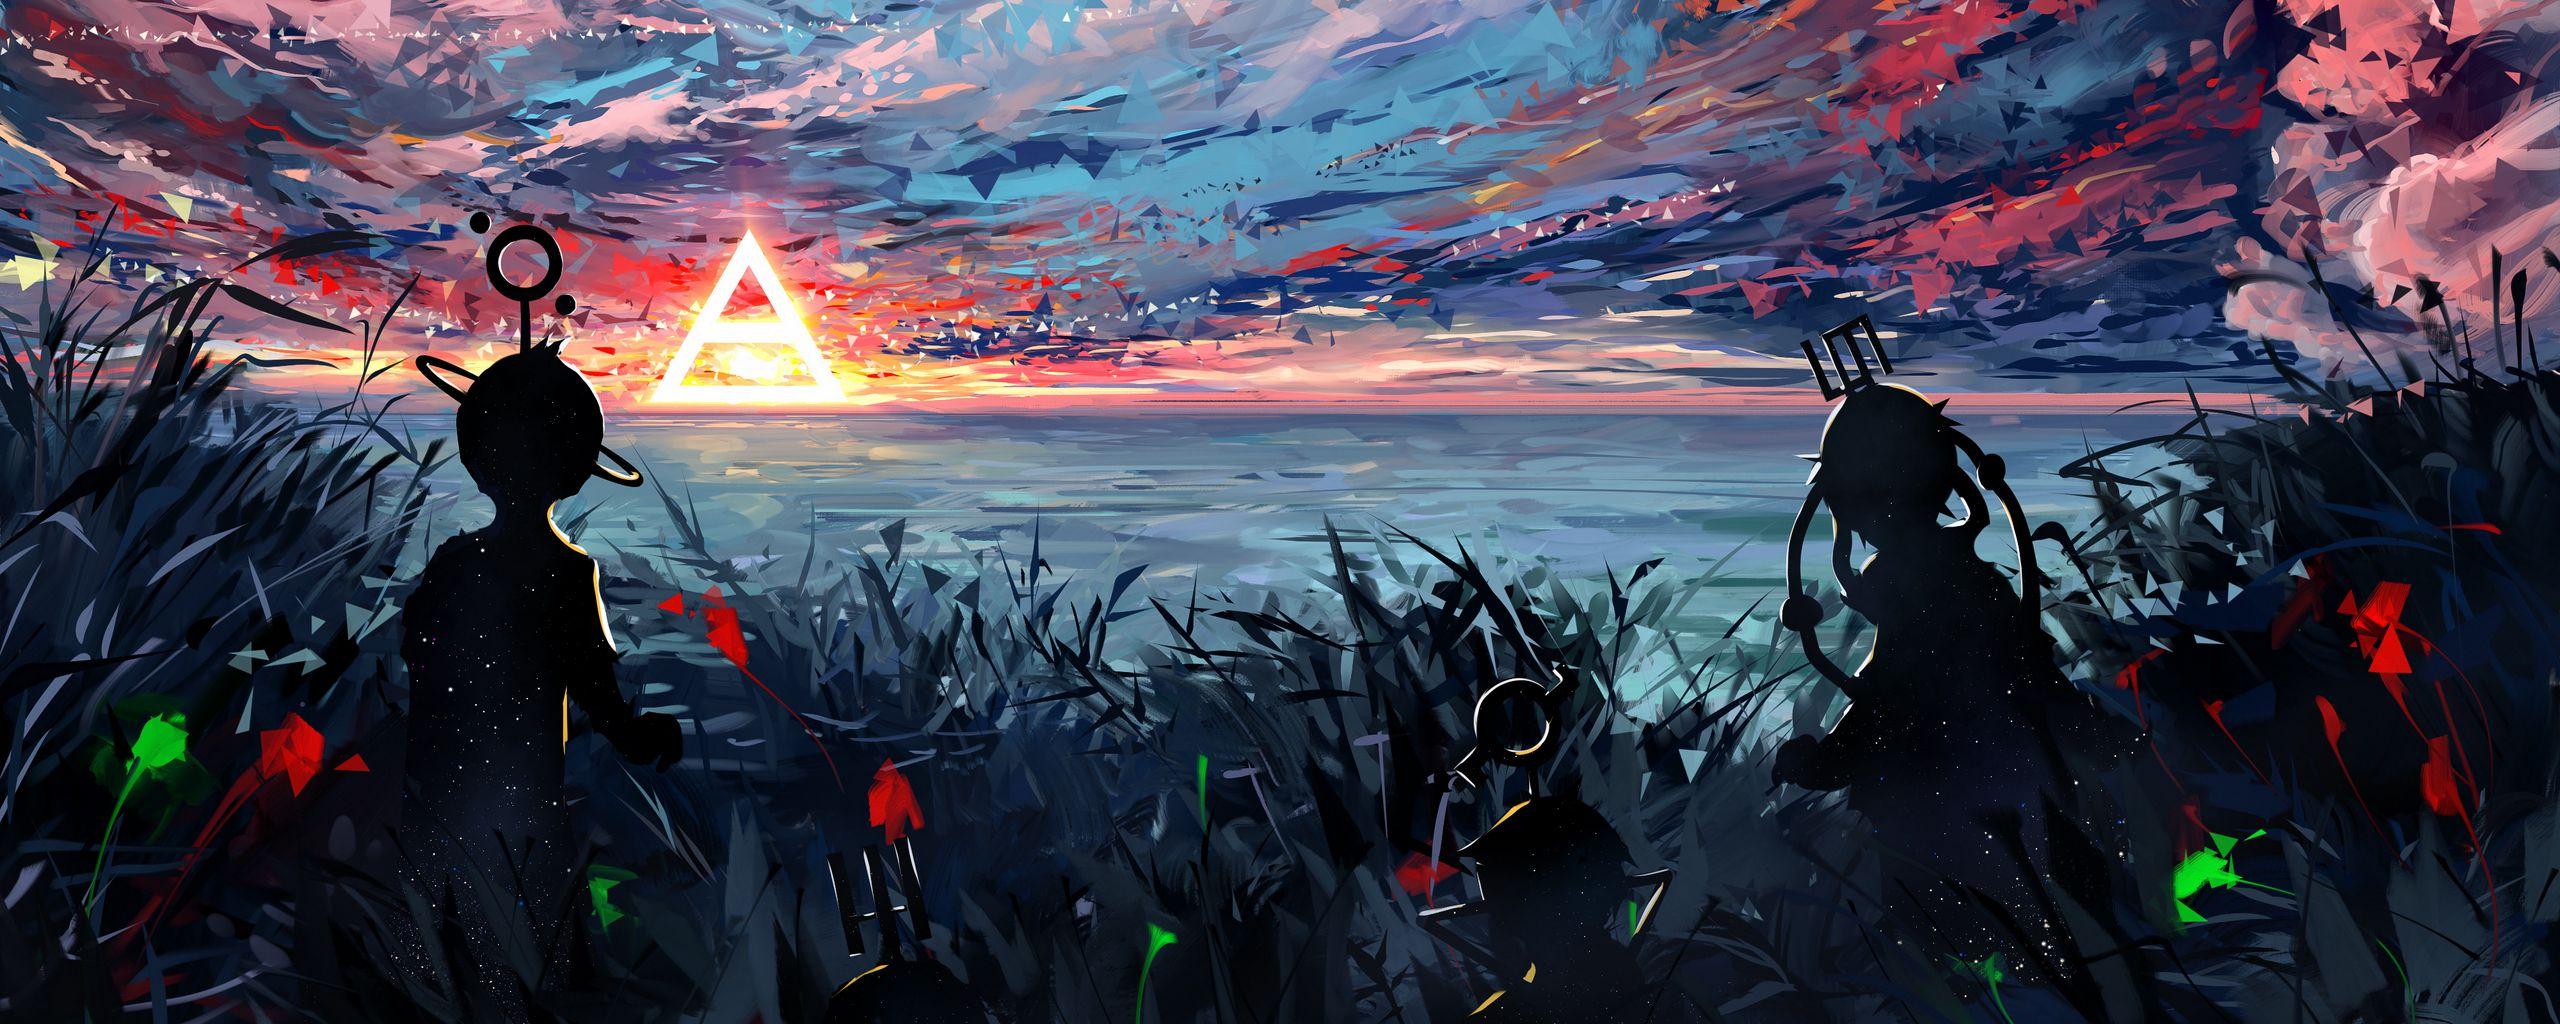 2560x1024 Wallpaper silhouette, art, sky, spots, colorful